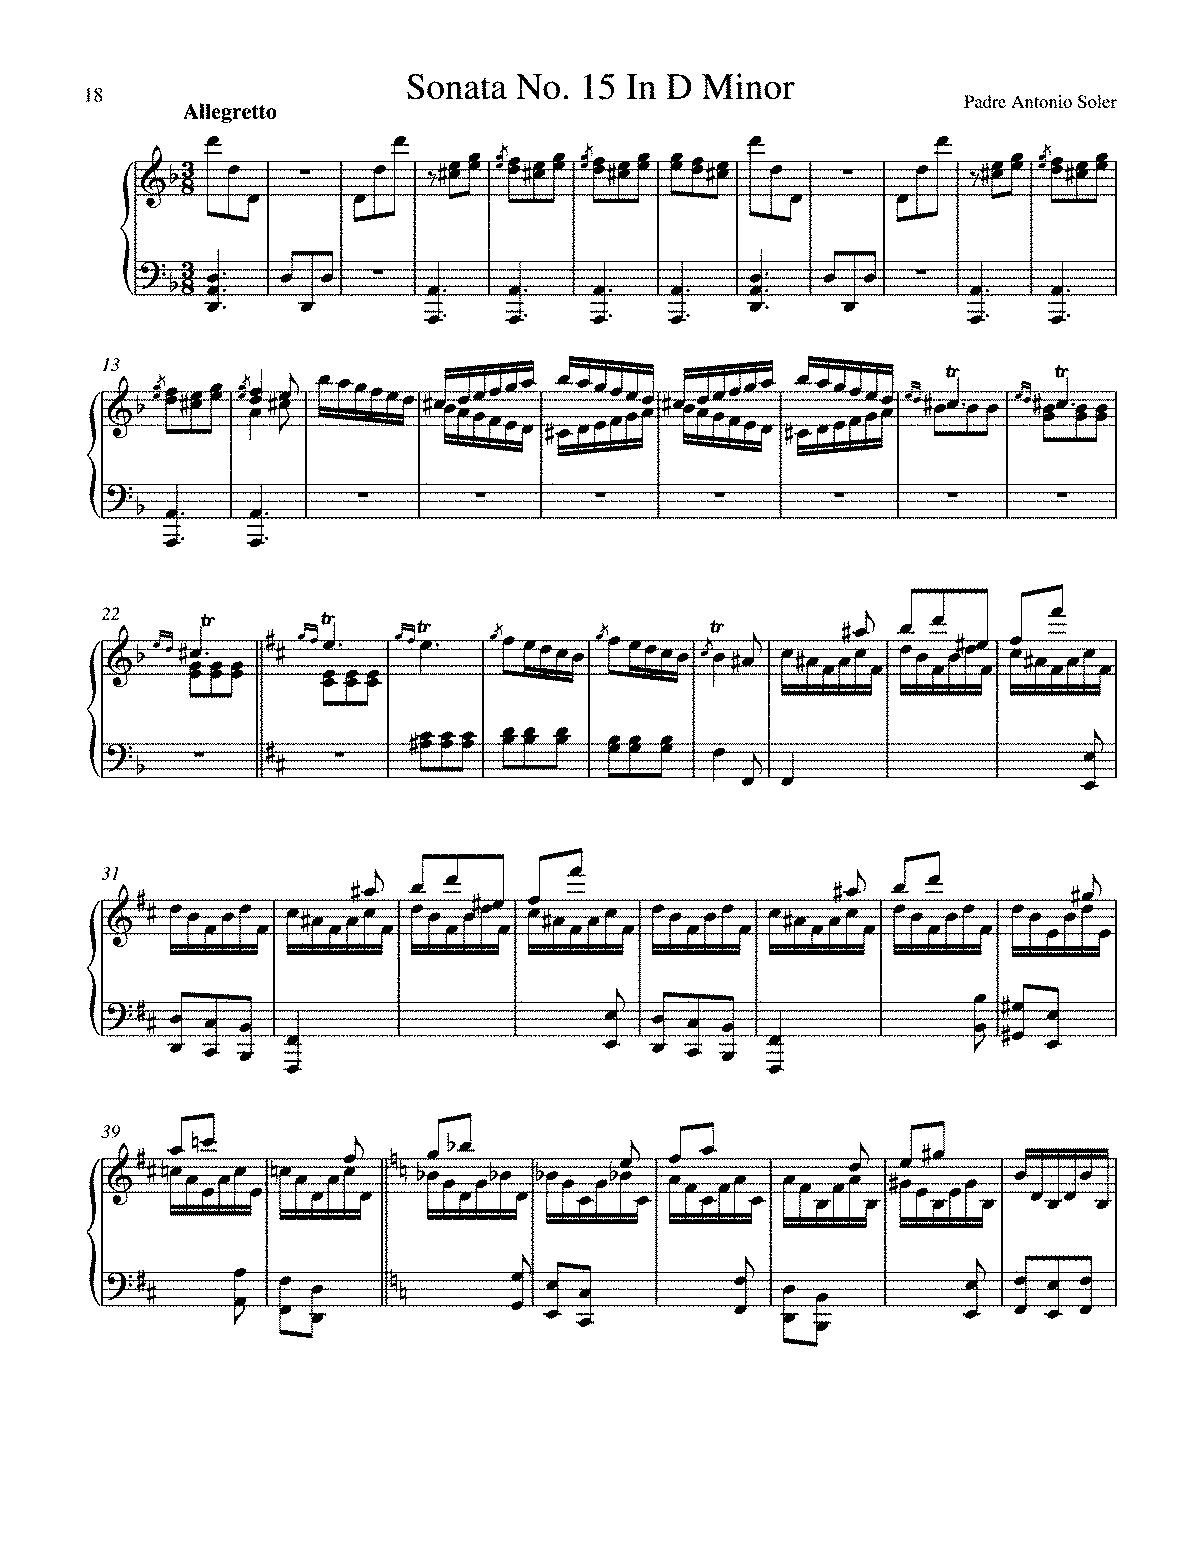 Keyboard sonata in d minor r15 soler antonio imslppetrucci arrangements and transcriptions hexwebz Choice Image